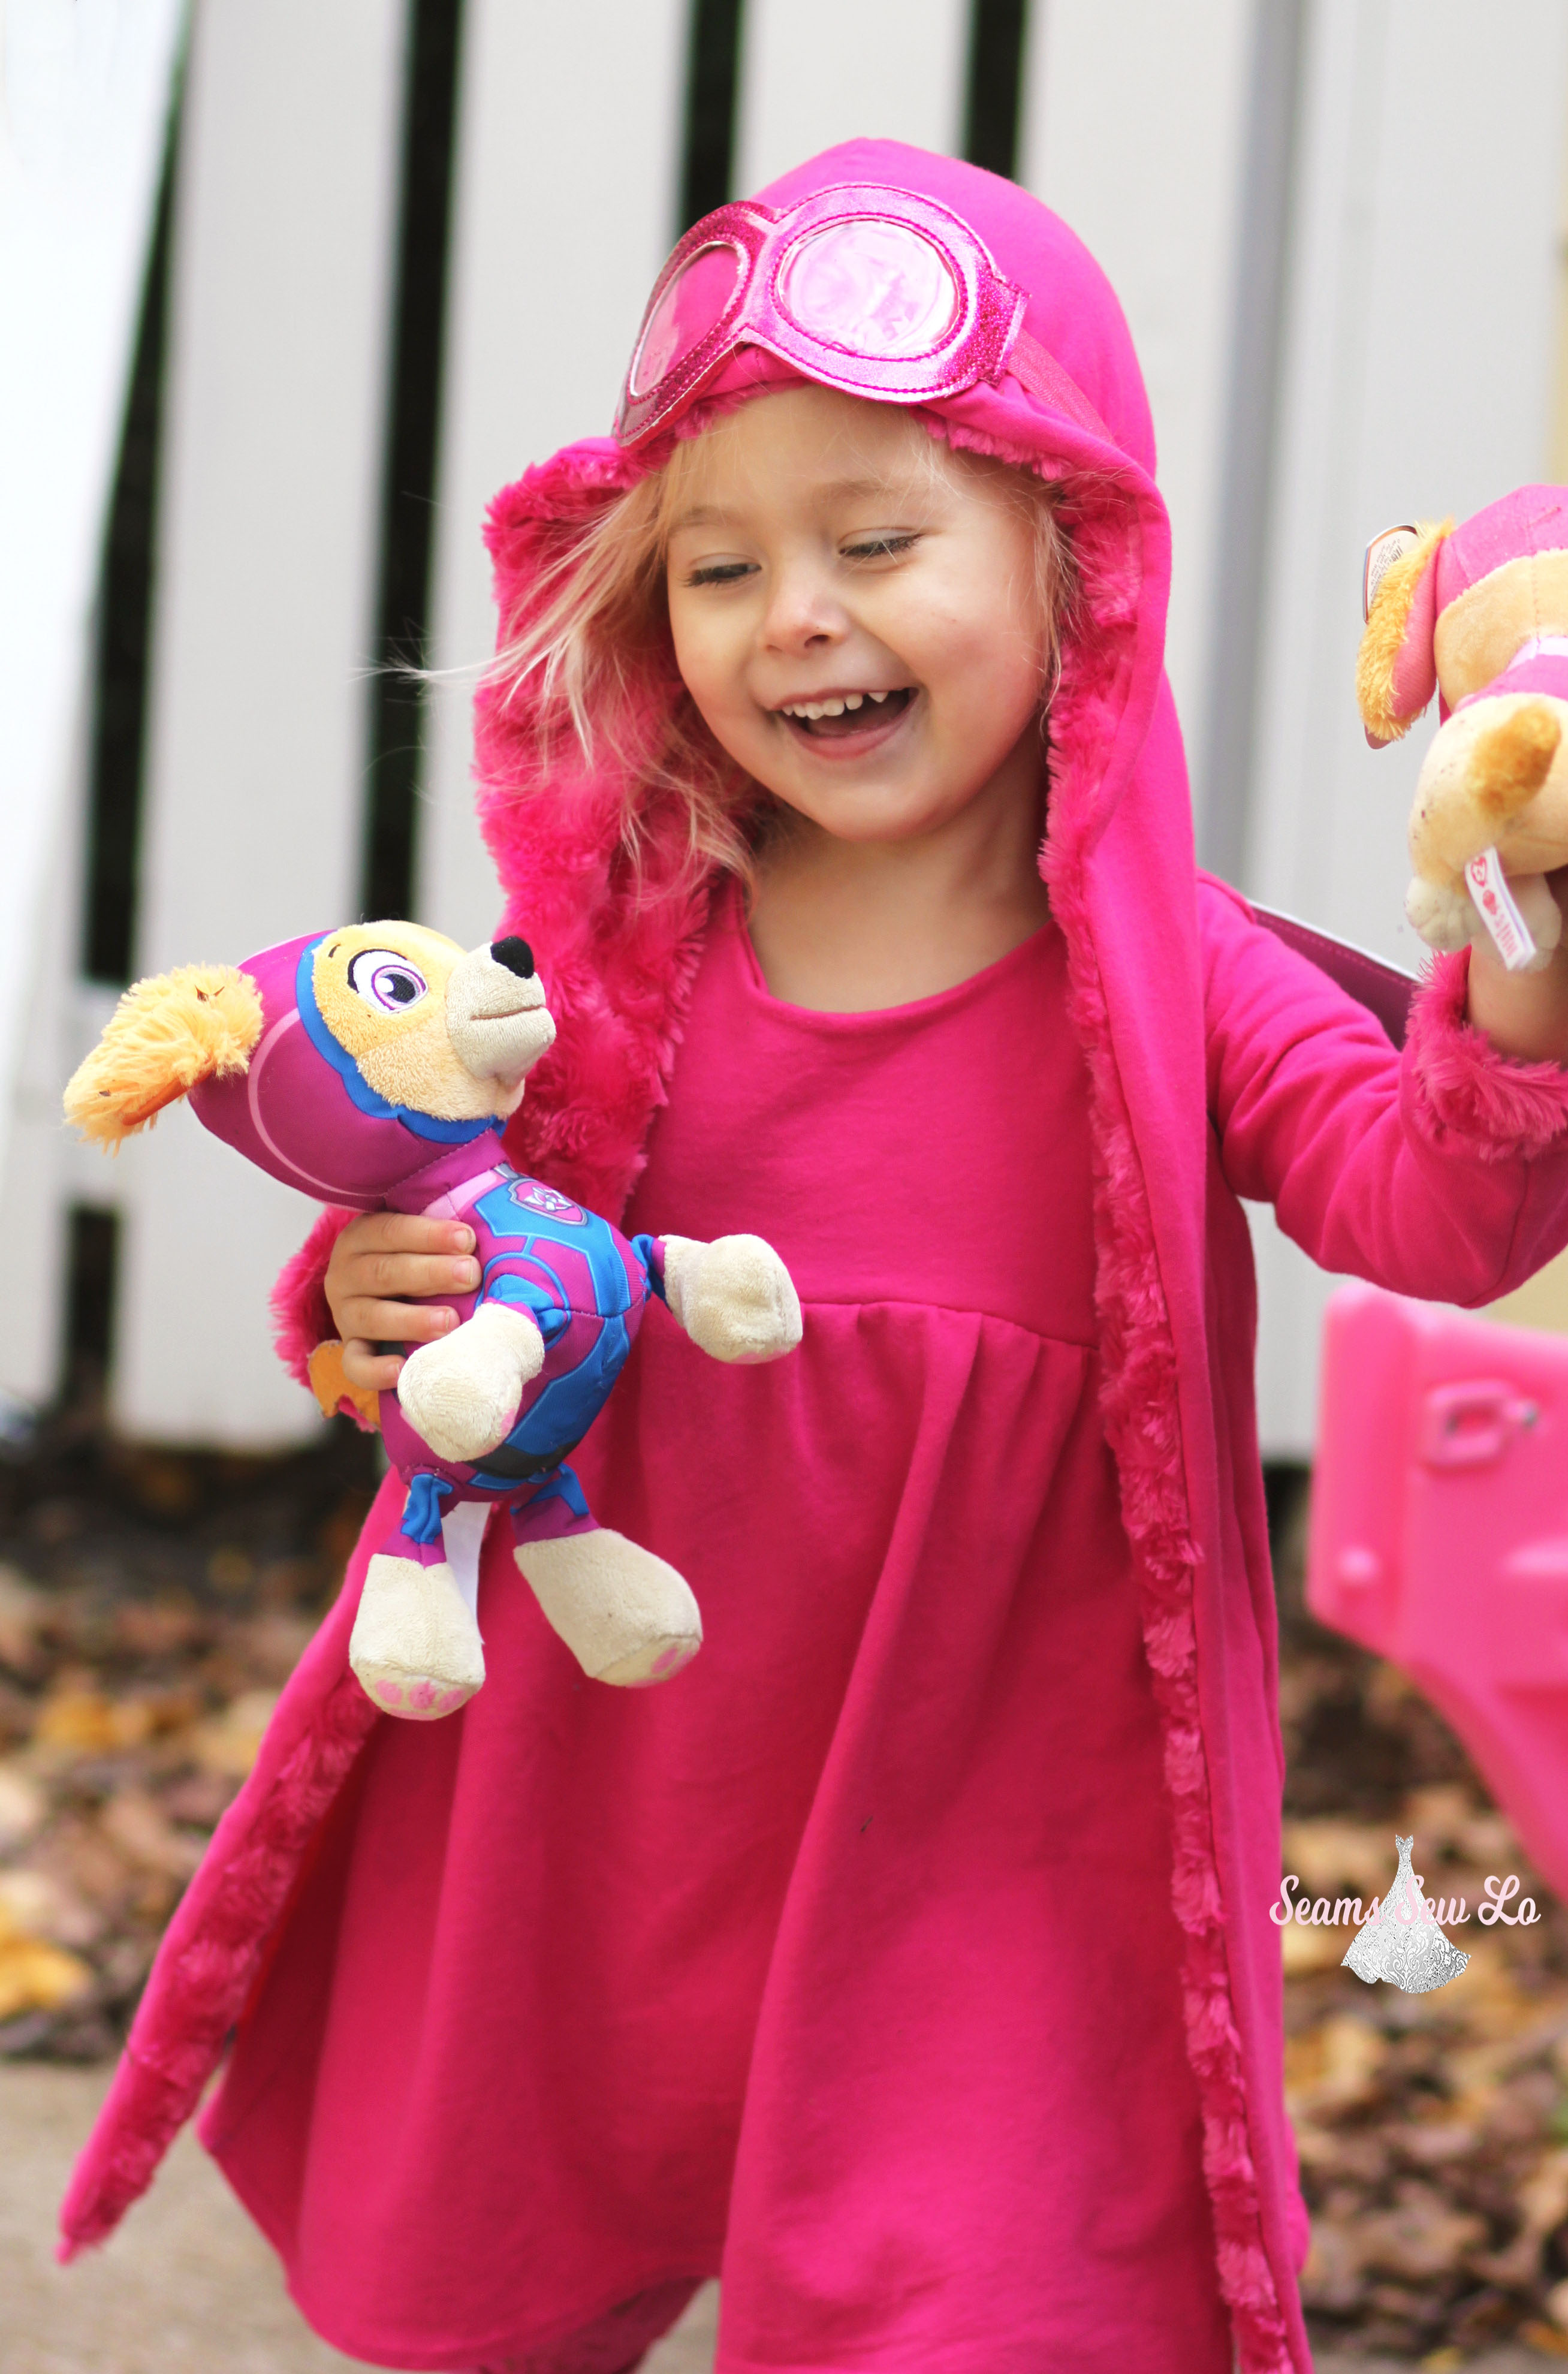 0243c2f56e299 diy skye halloween costume paw patrol for toddlers - Seams Sew Lo